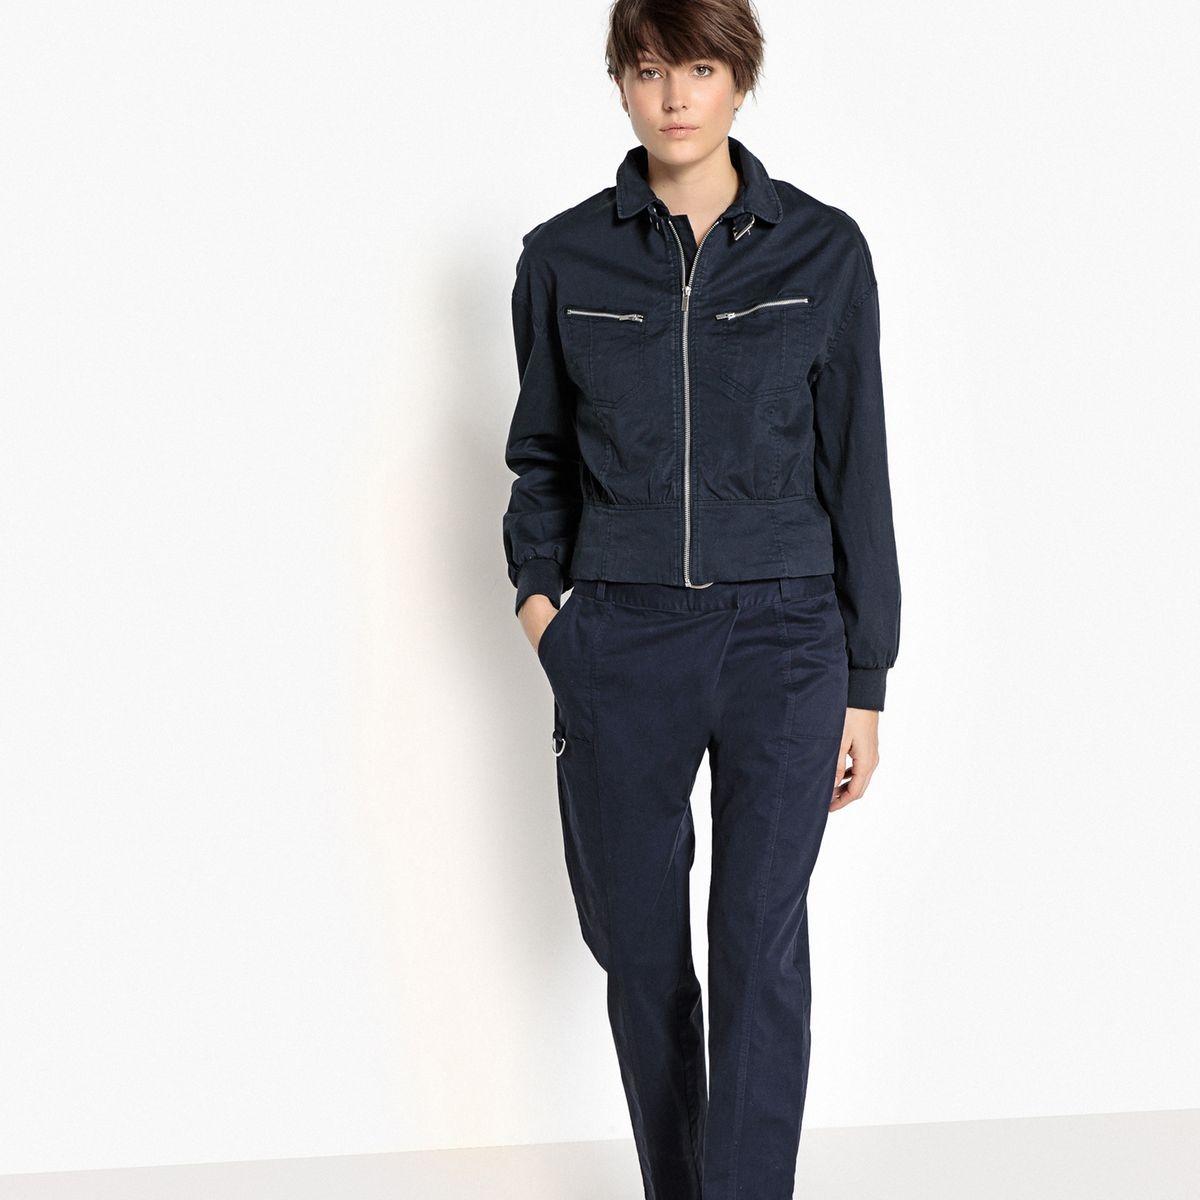 Veste zippée cintrée en jean léger